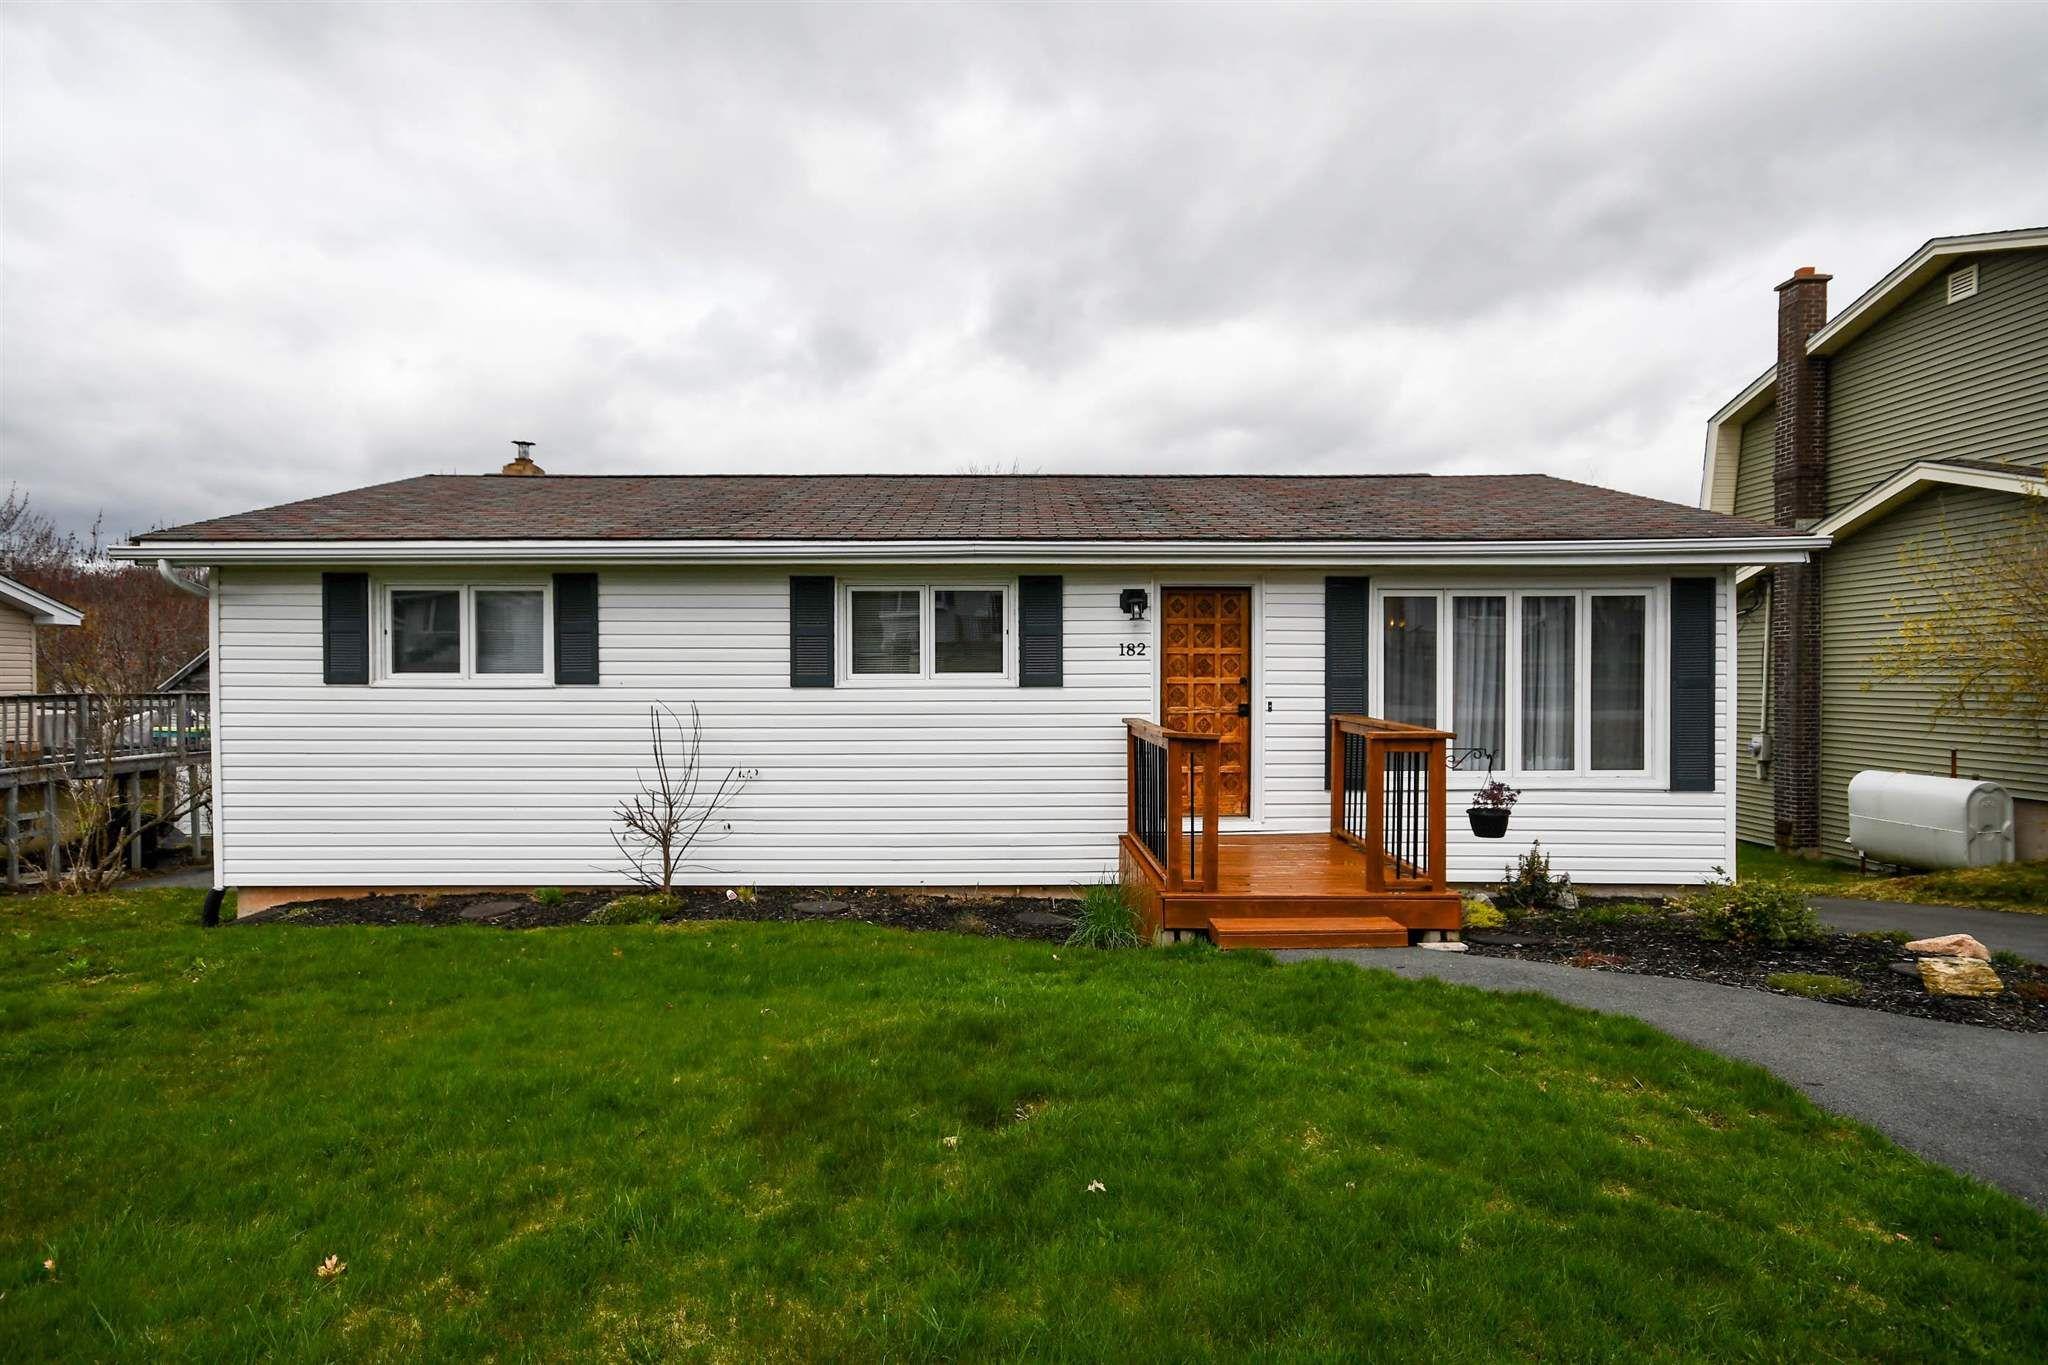 Main Photo: 182 Alder Crescent in Lower Sackville: 25-Sackville Residential for sale (Halifax-Dartmouth)  : MLS®# 202110205